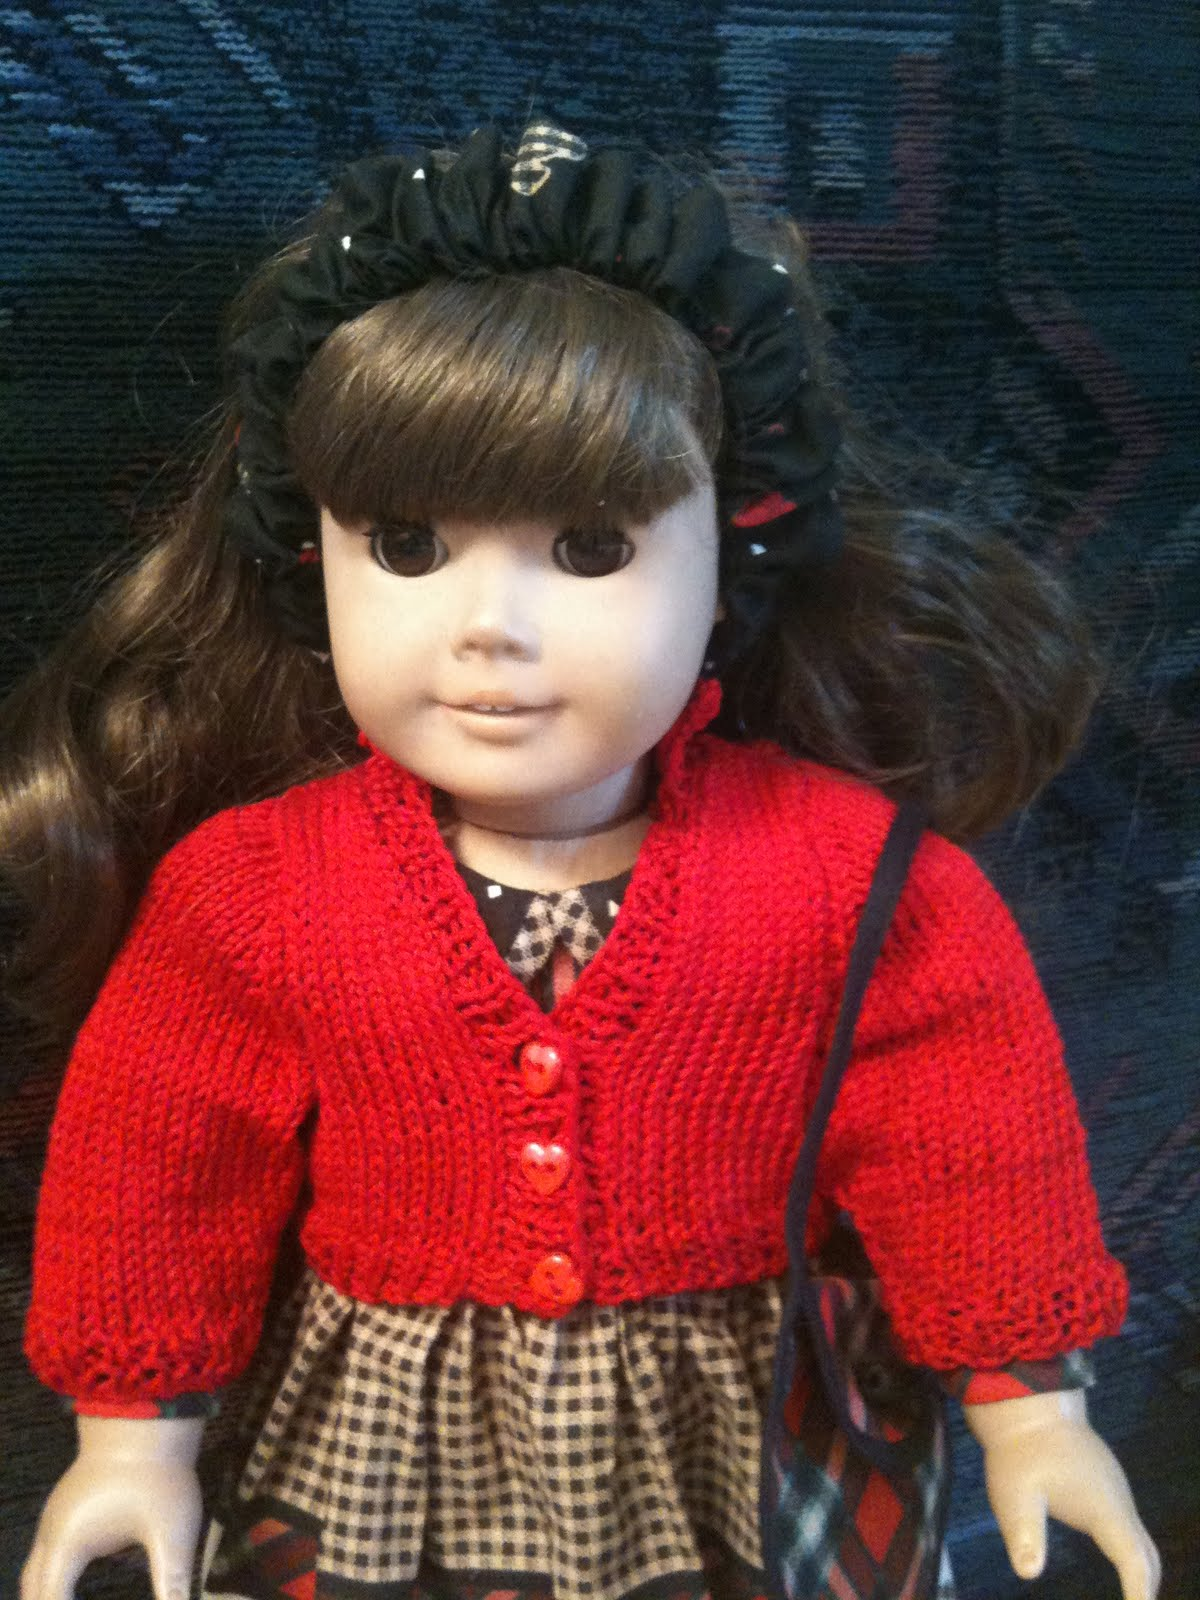 Free Knitting Pattern Doll Cardigan : Old Jail Arts: Free Pattern - Knit Cotton Cardigan for 18 ...